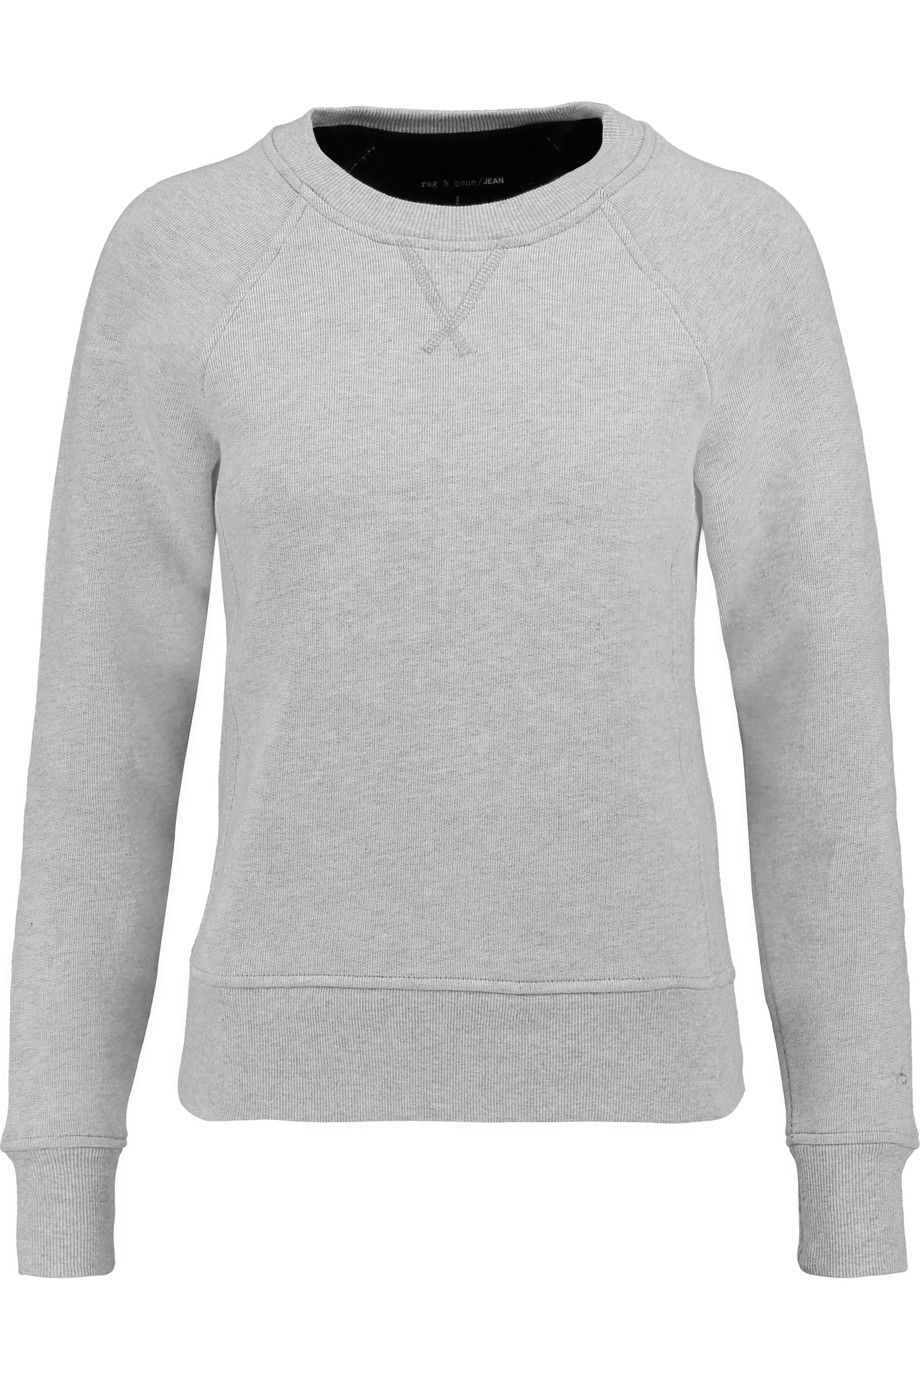 RAG & BONE Langford Cotton-Fleece Sweatshirt. #ragbone #cloth #sweatshirt